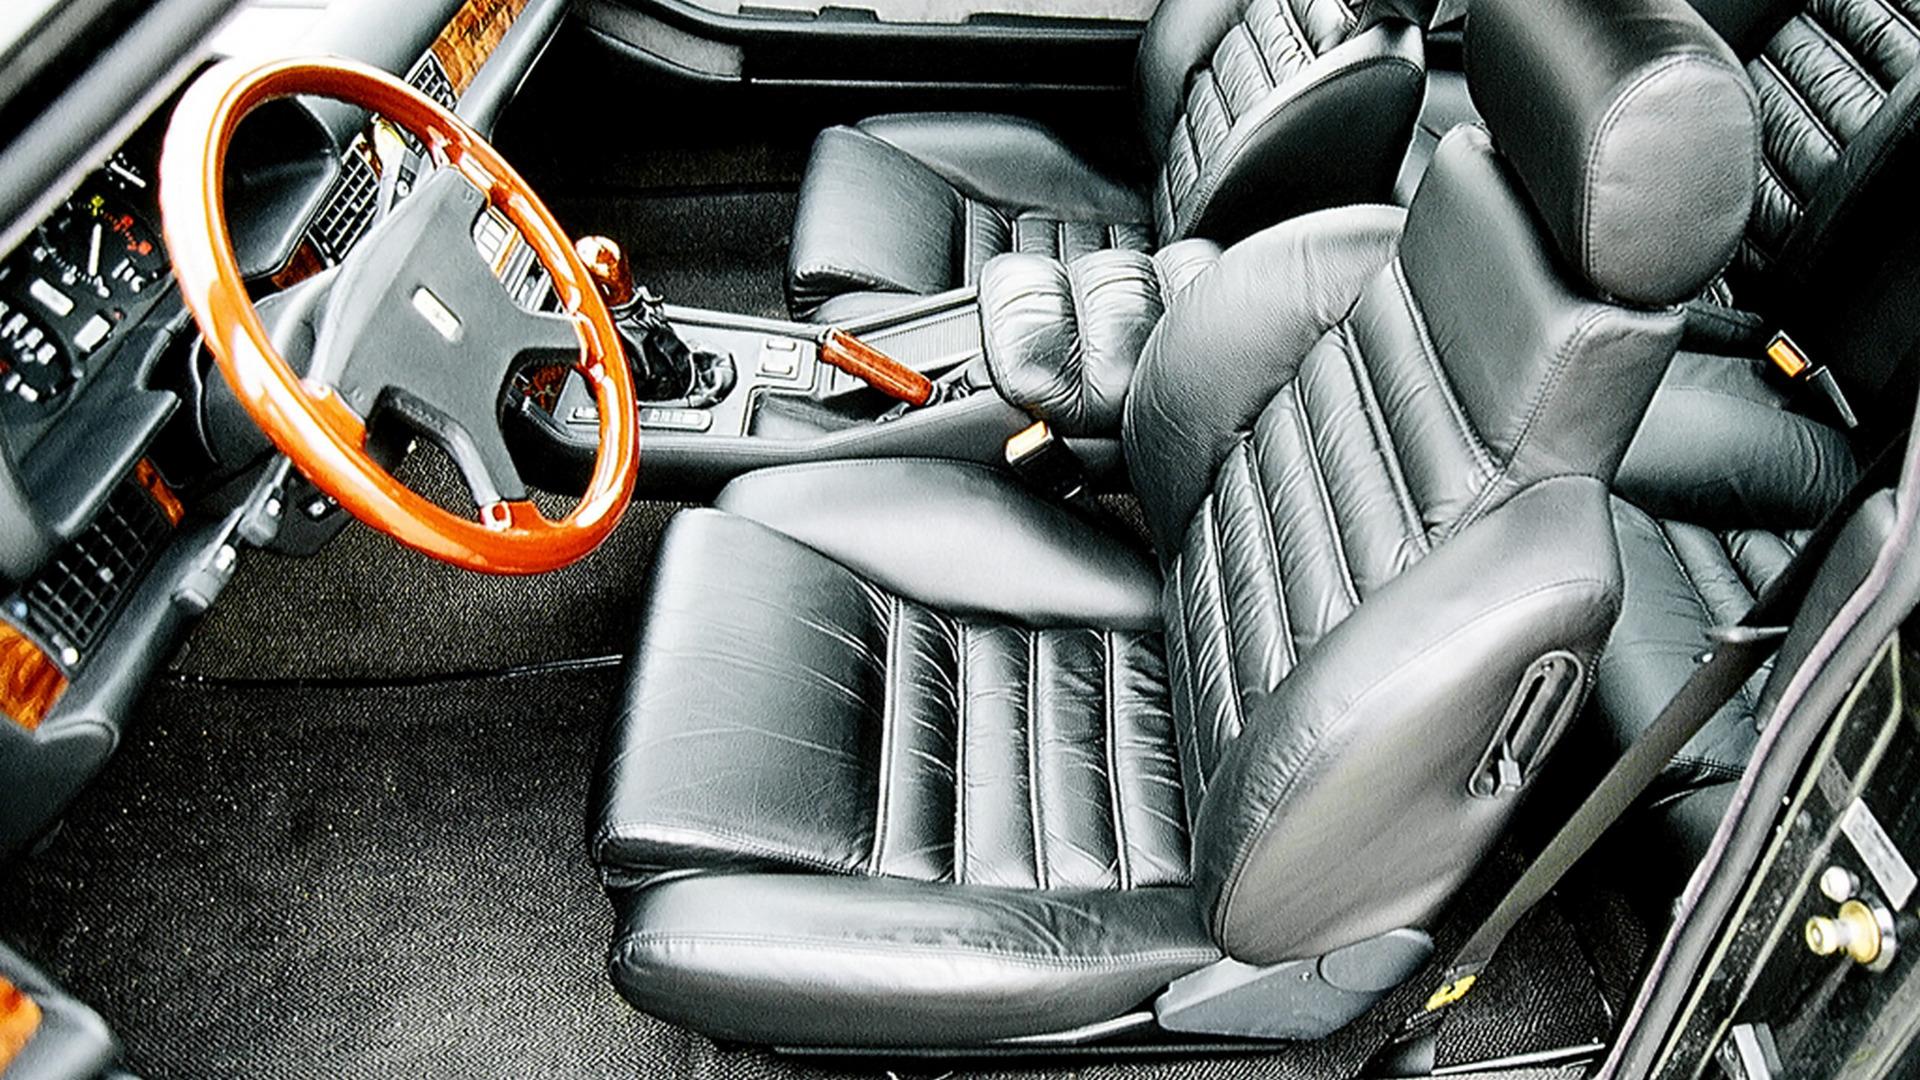 002 maserati-biturbo-coupe (1).jpg